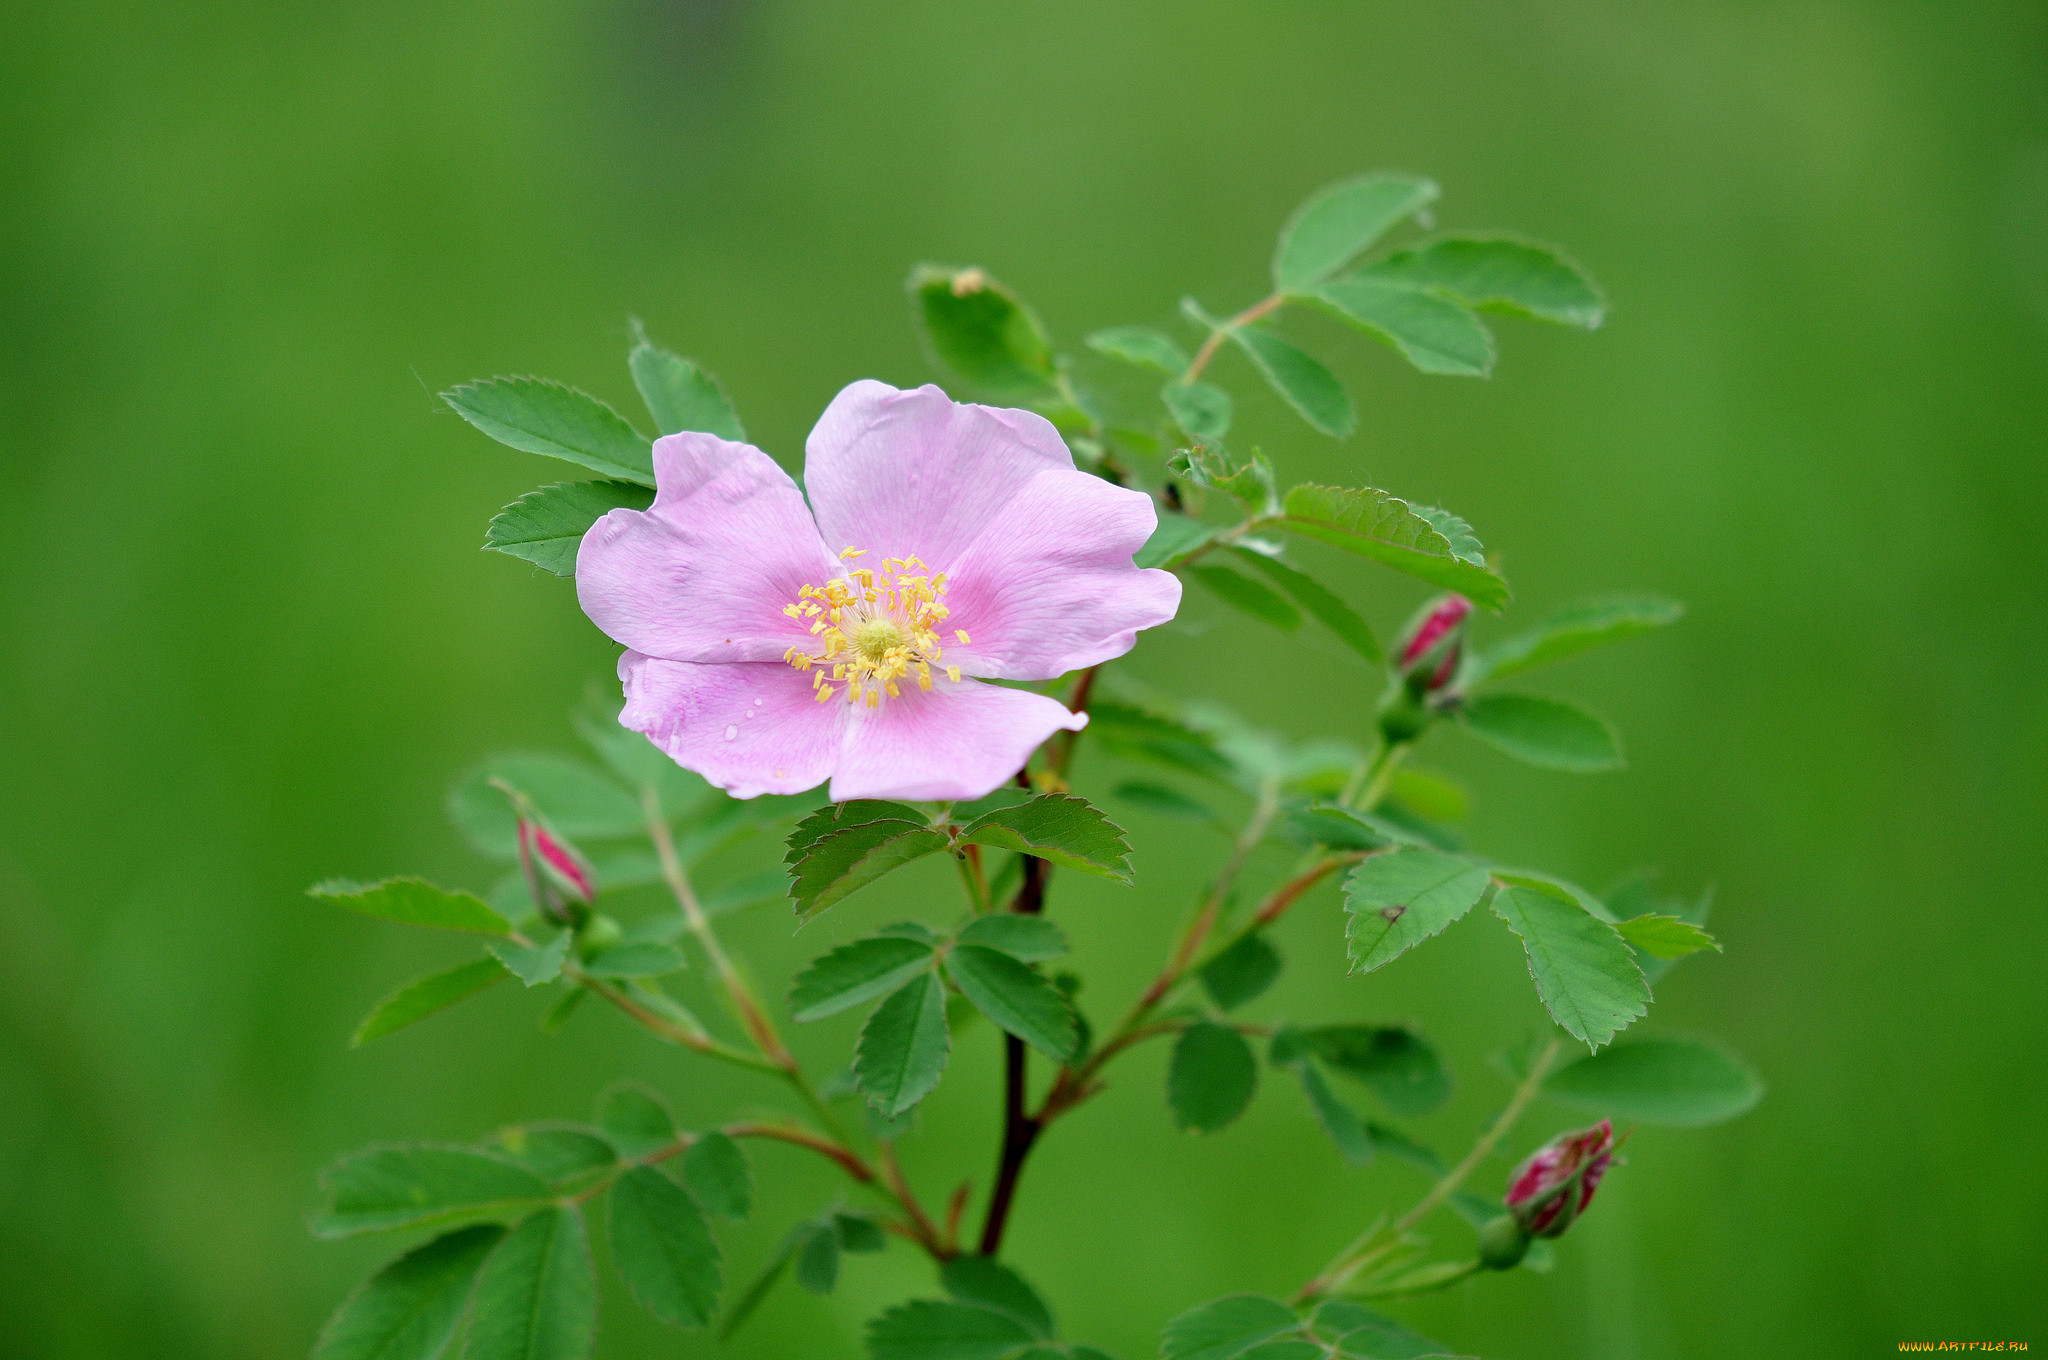 картинки на аву цветы шиповника тут мне стало